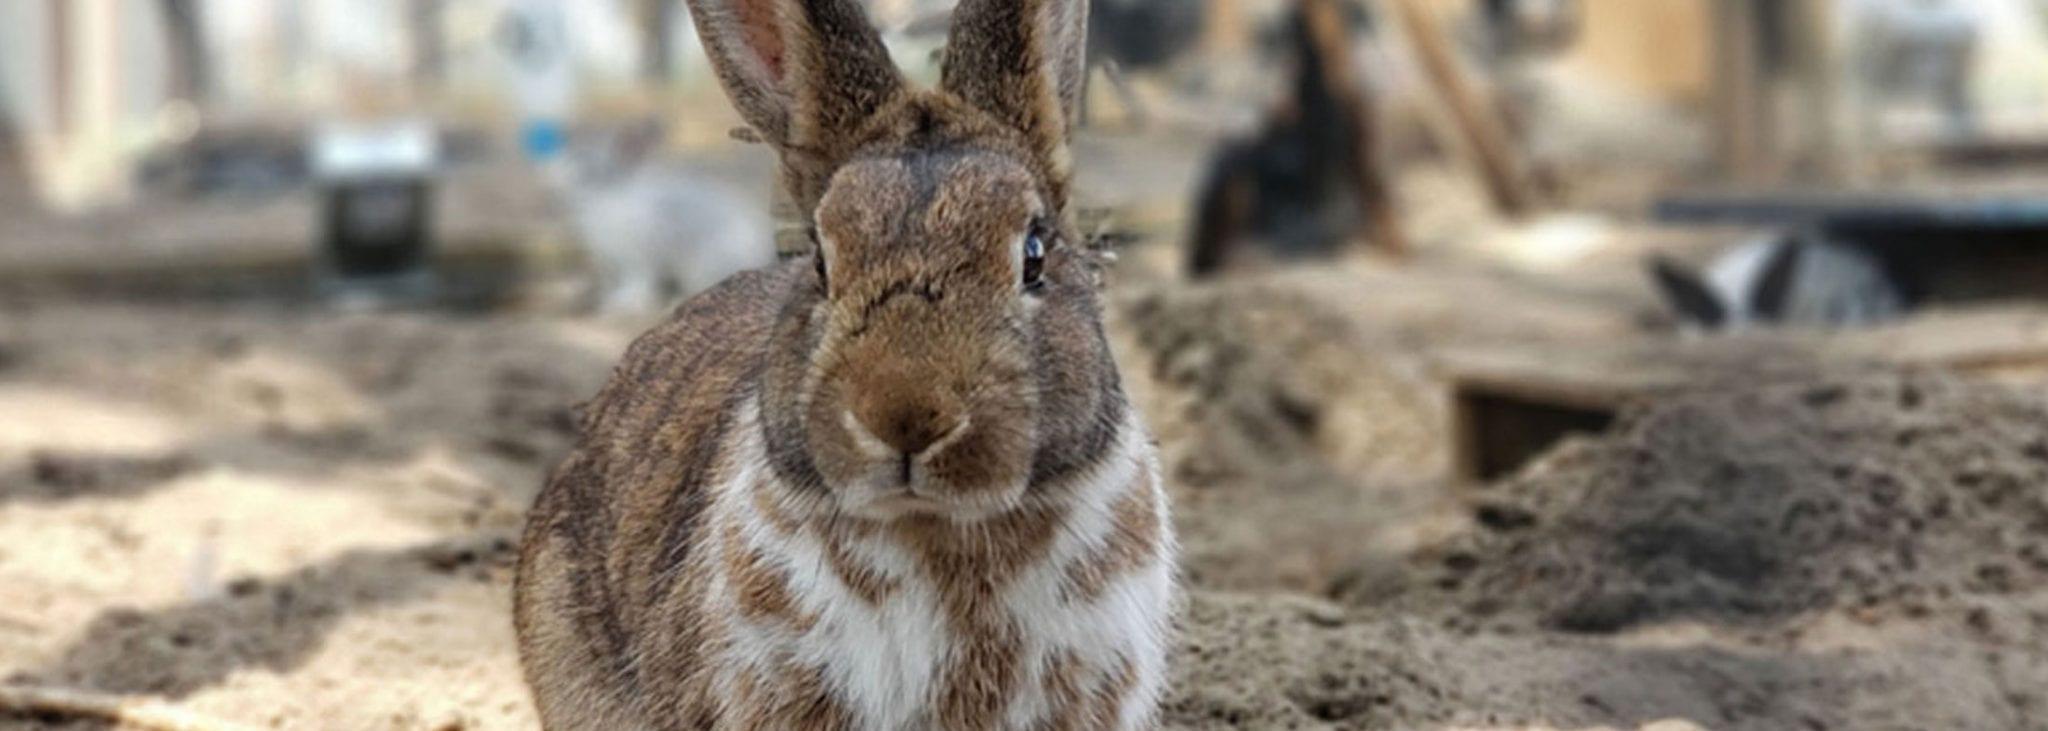 Bunny 101 Raising Rabbits Maizey Meadows